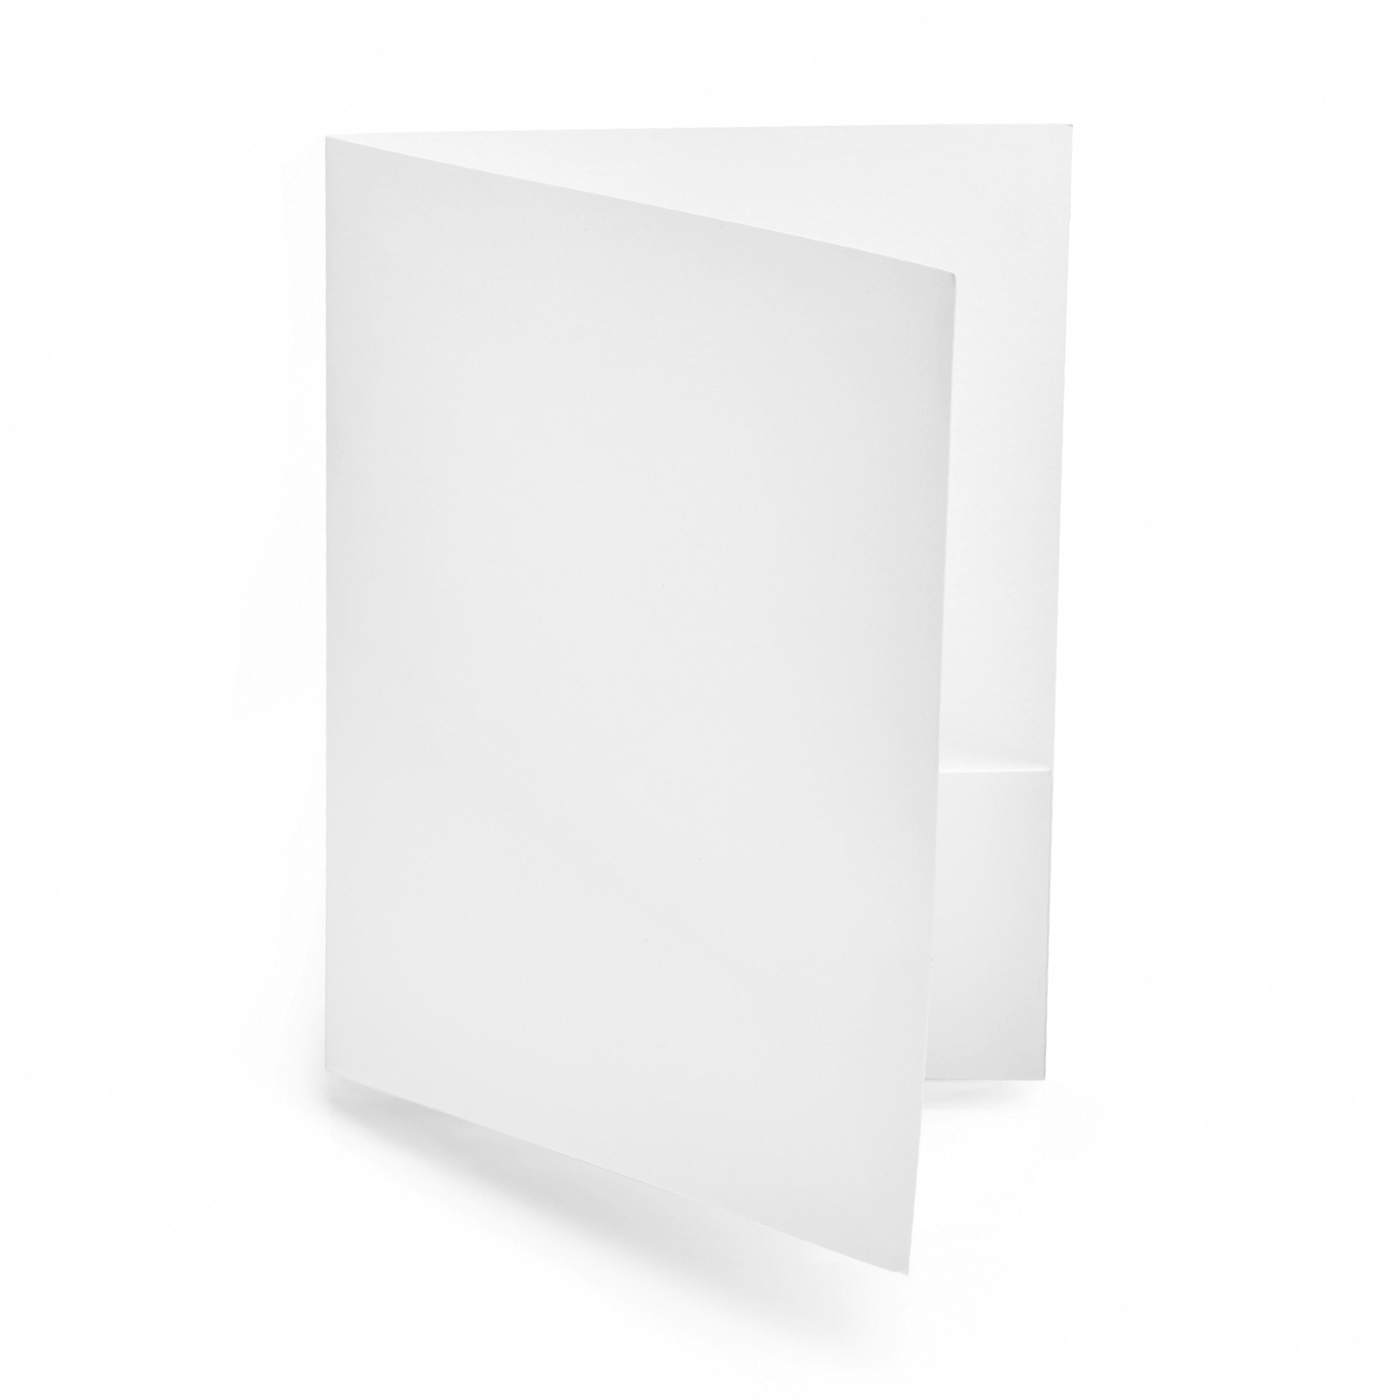 Blanks/USA Printable Folder Packet